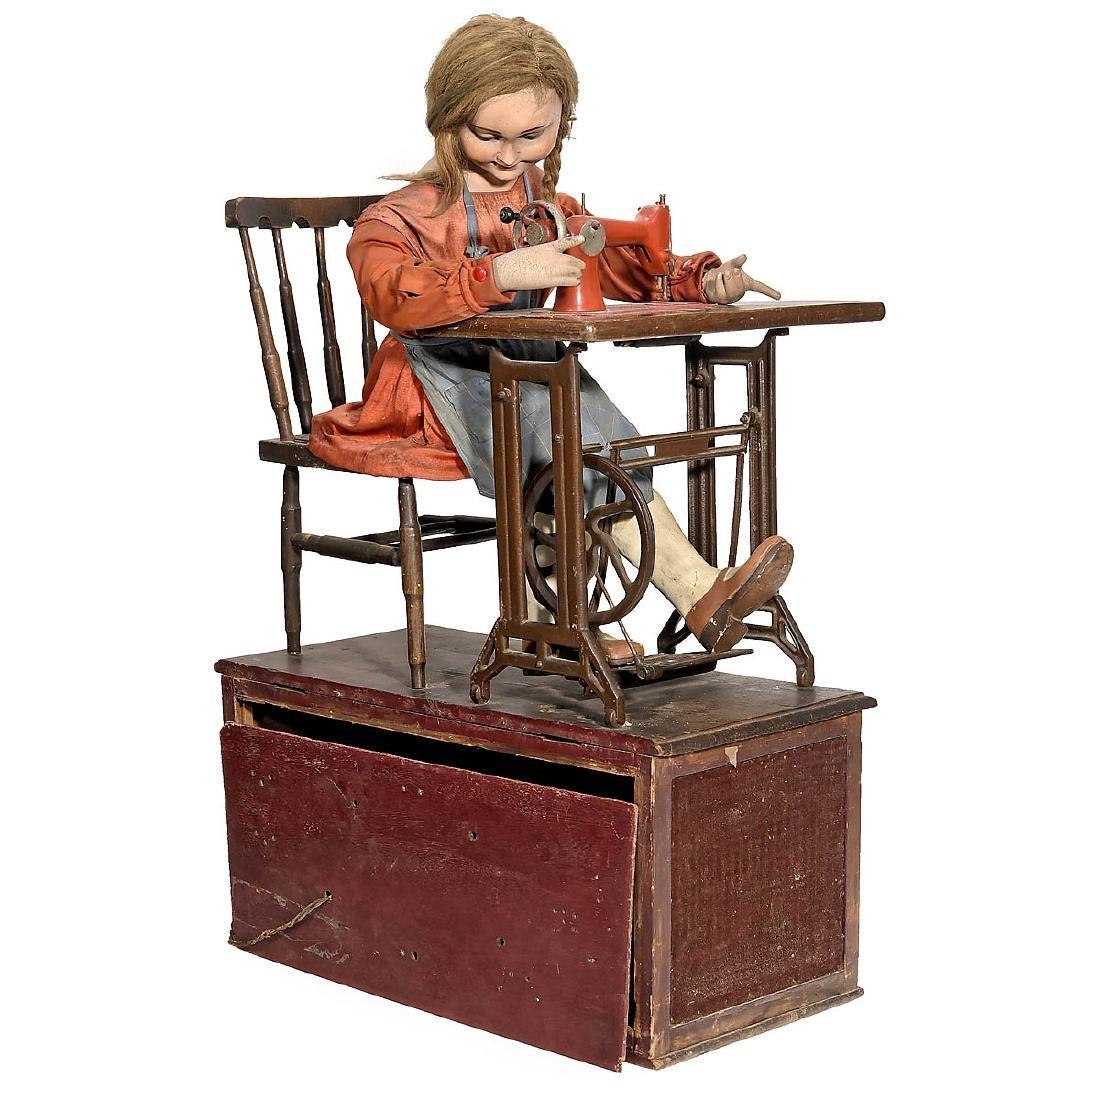 Advertising Automaton with Sigma Sewing Machine, c.